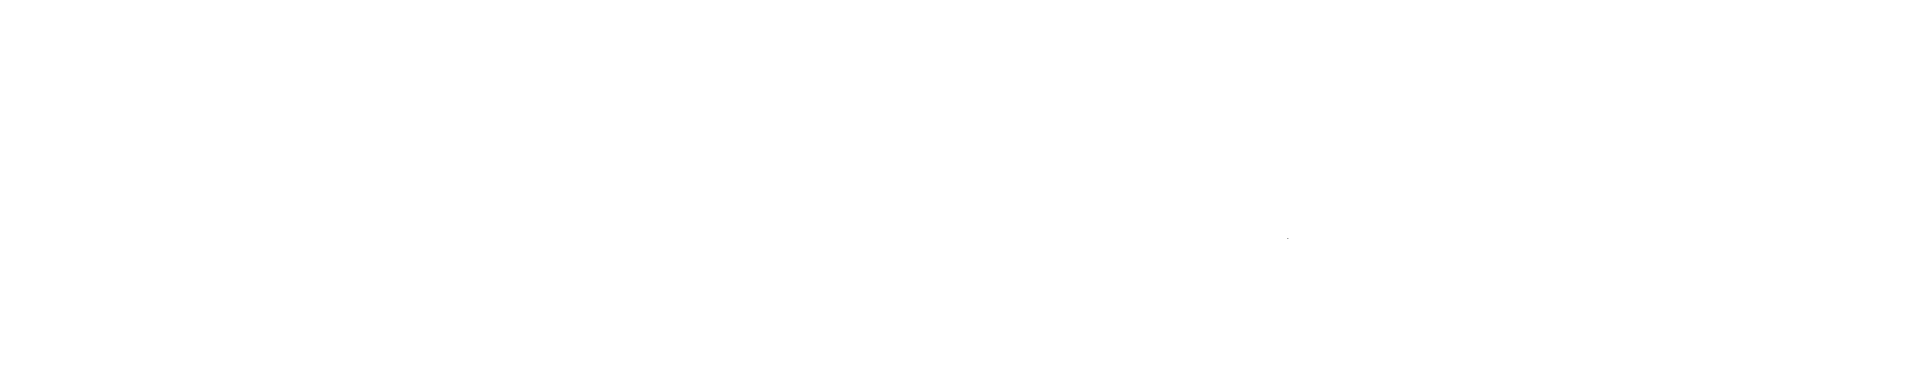 White-Label Digital Marketing Agency | Internet Marketing